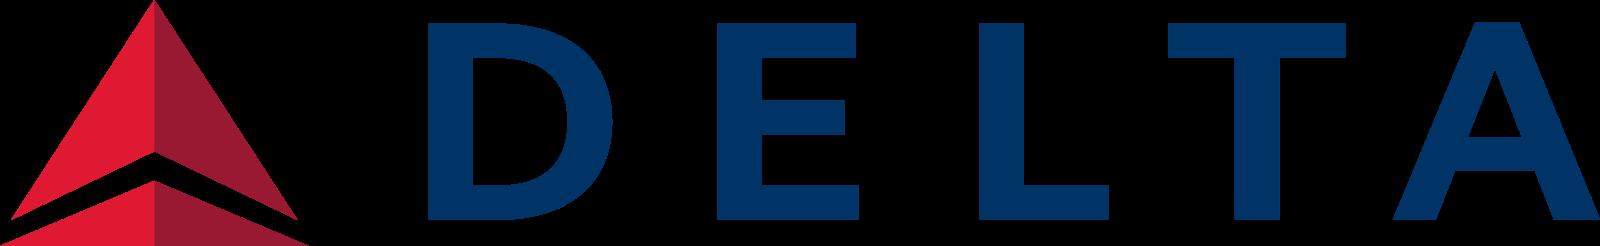 delta air lines logo 2 - Delta Air Lines Logo